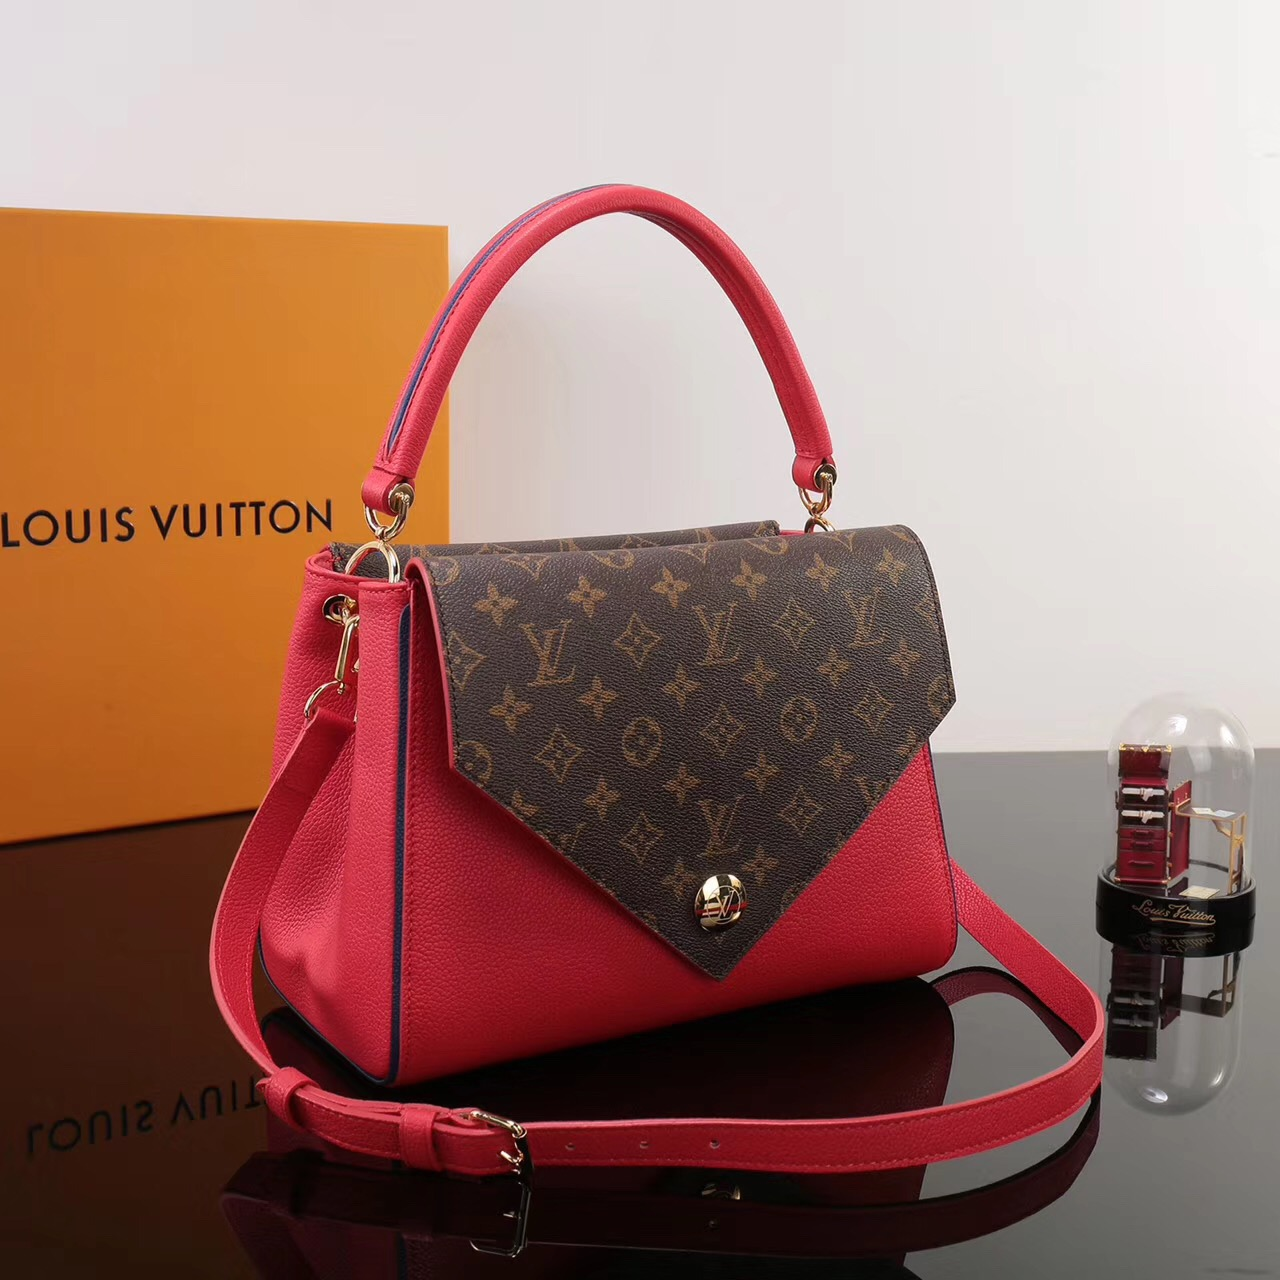 Lv Louis Vuitton Monogram Double V